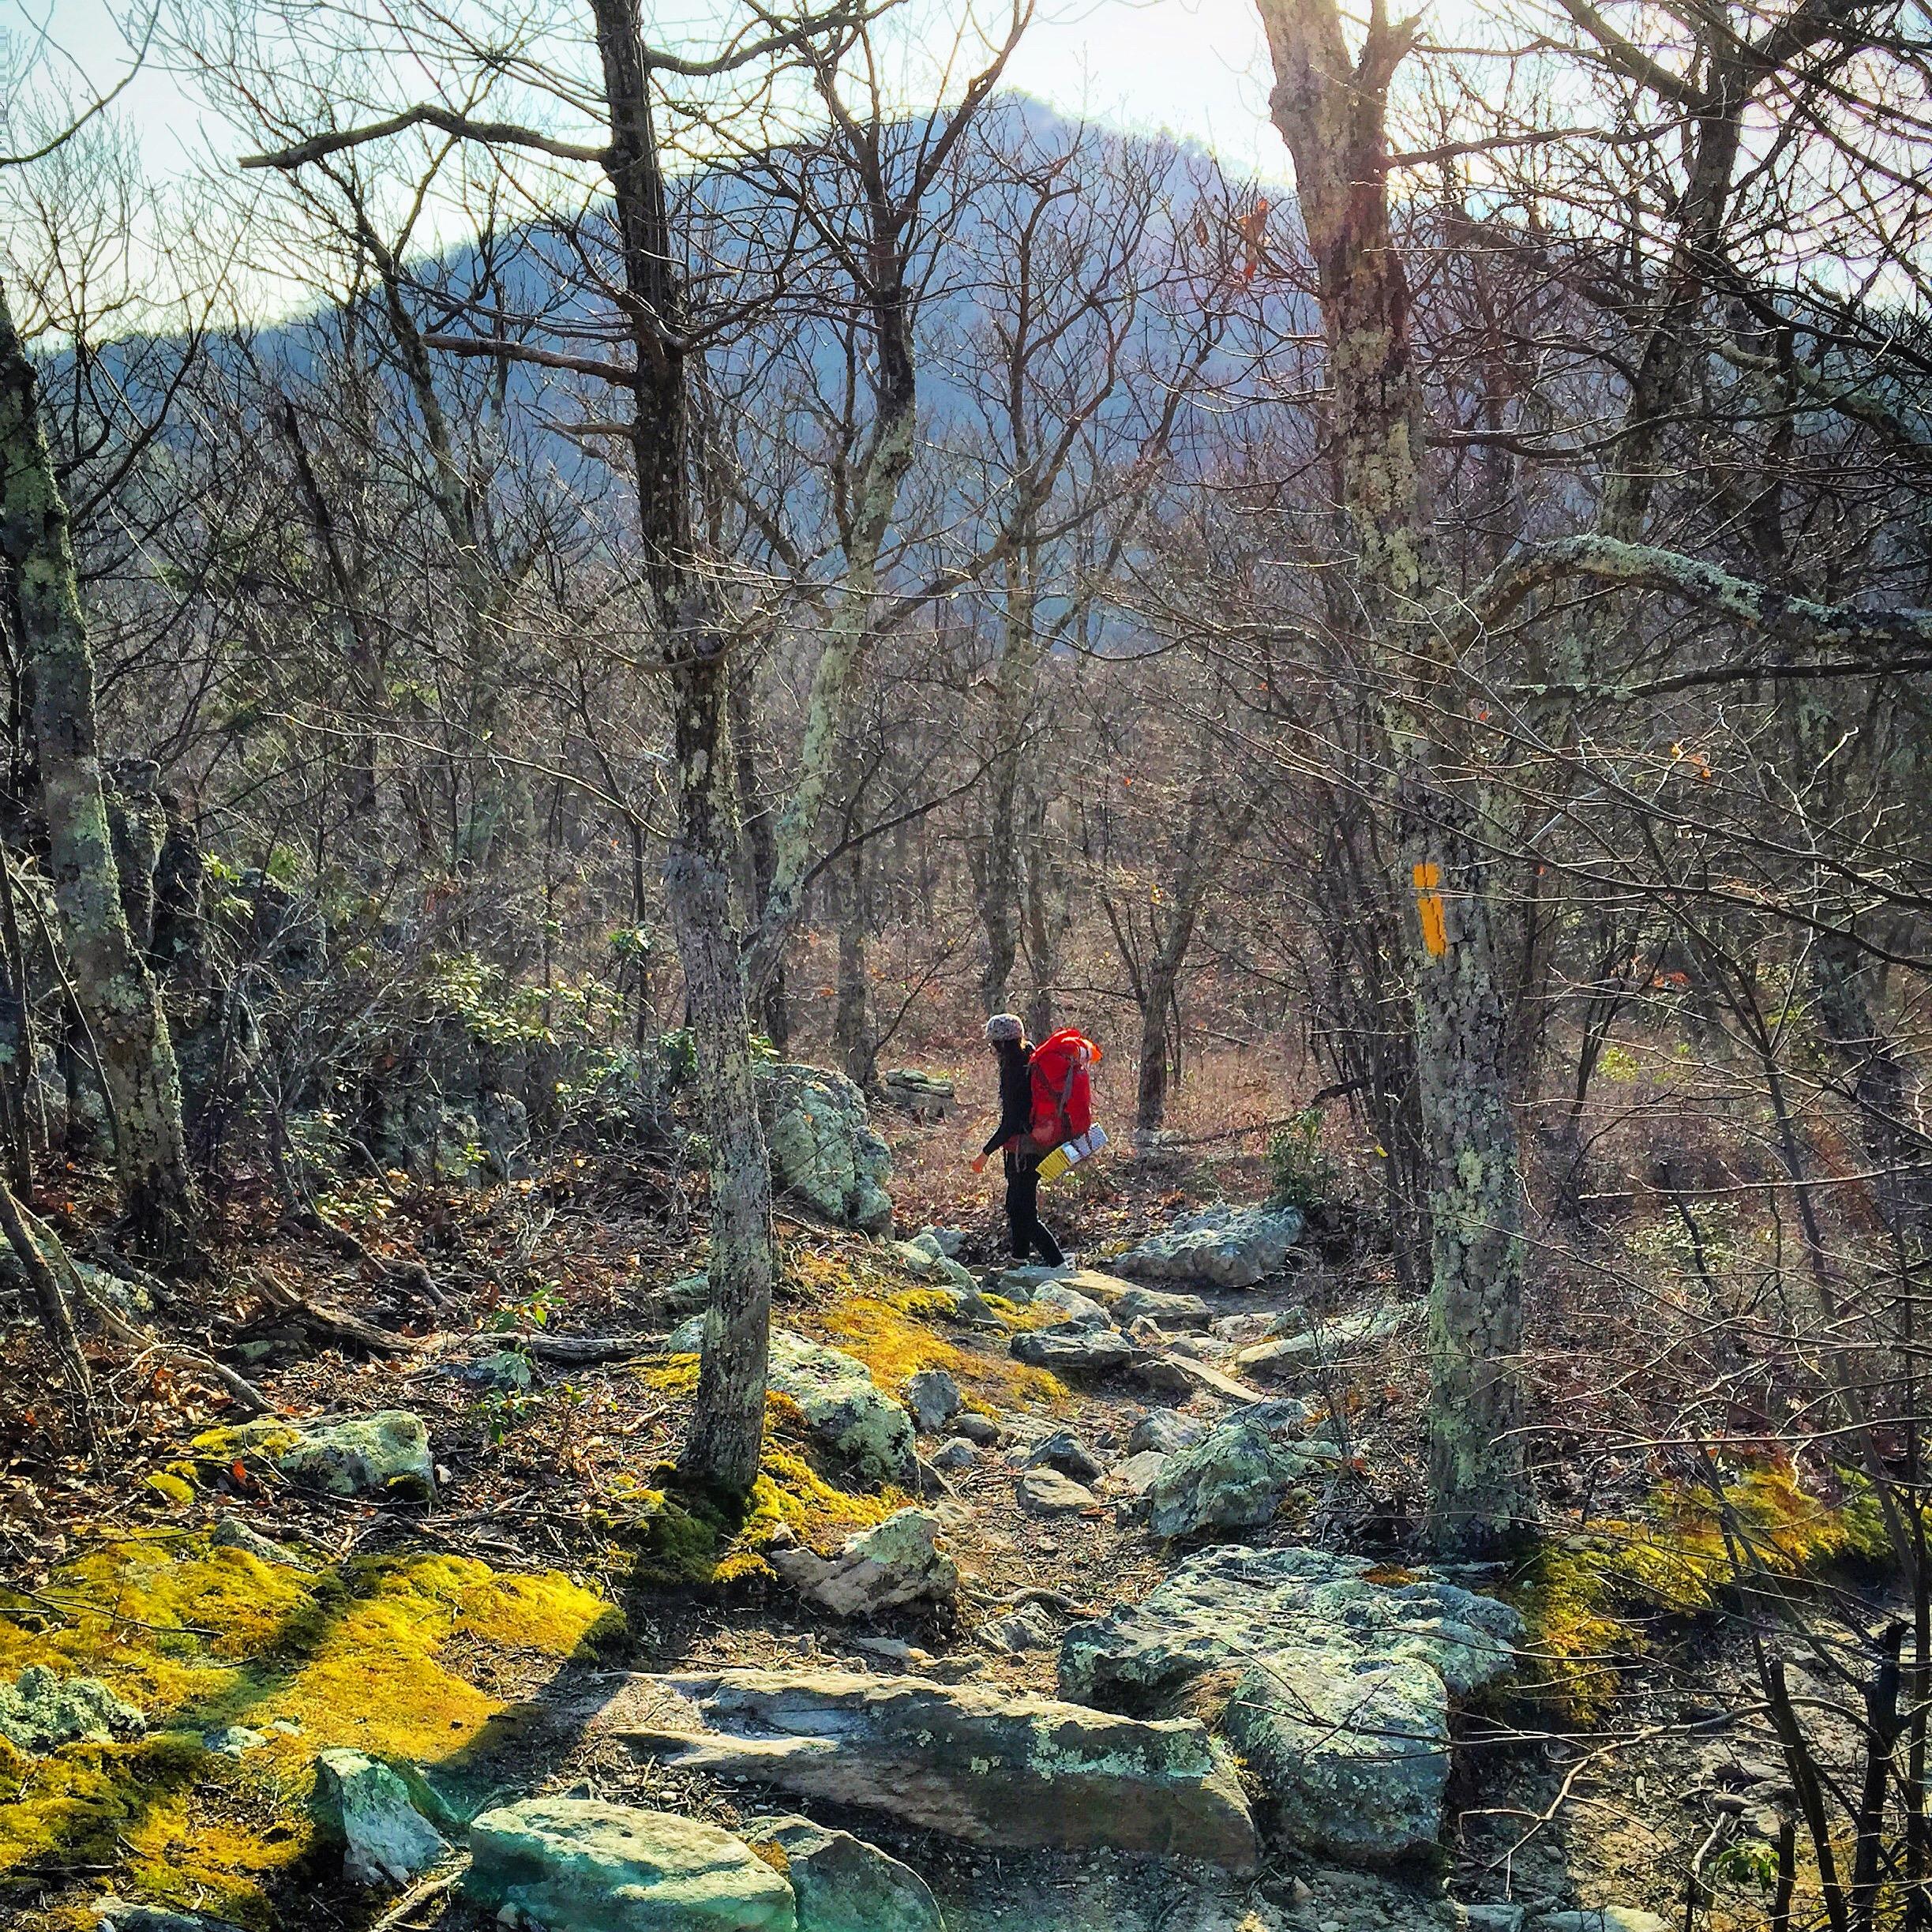 Tibbet Knob, George Washington National Forest, West Virginia